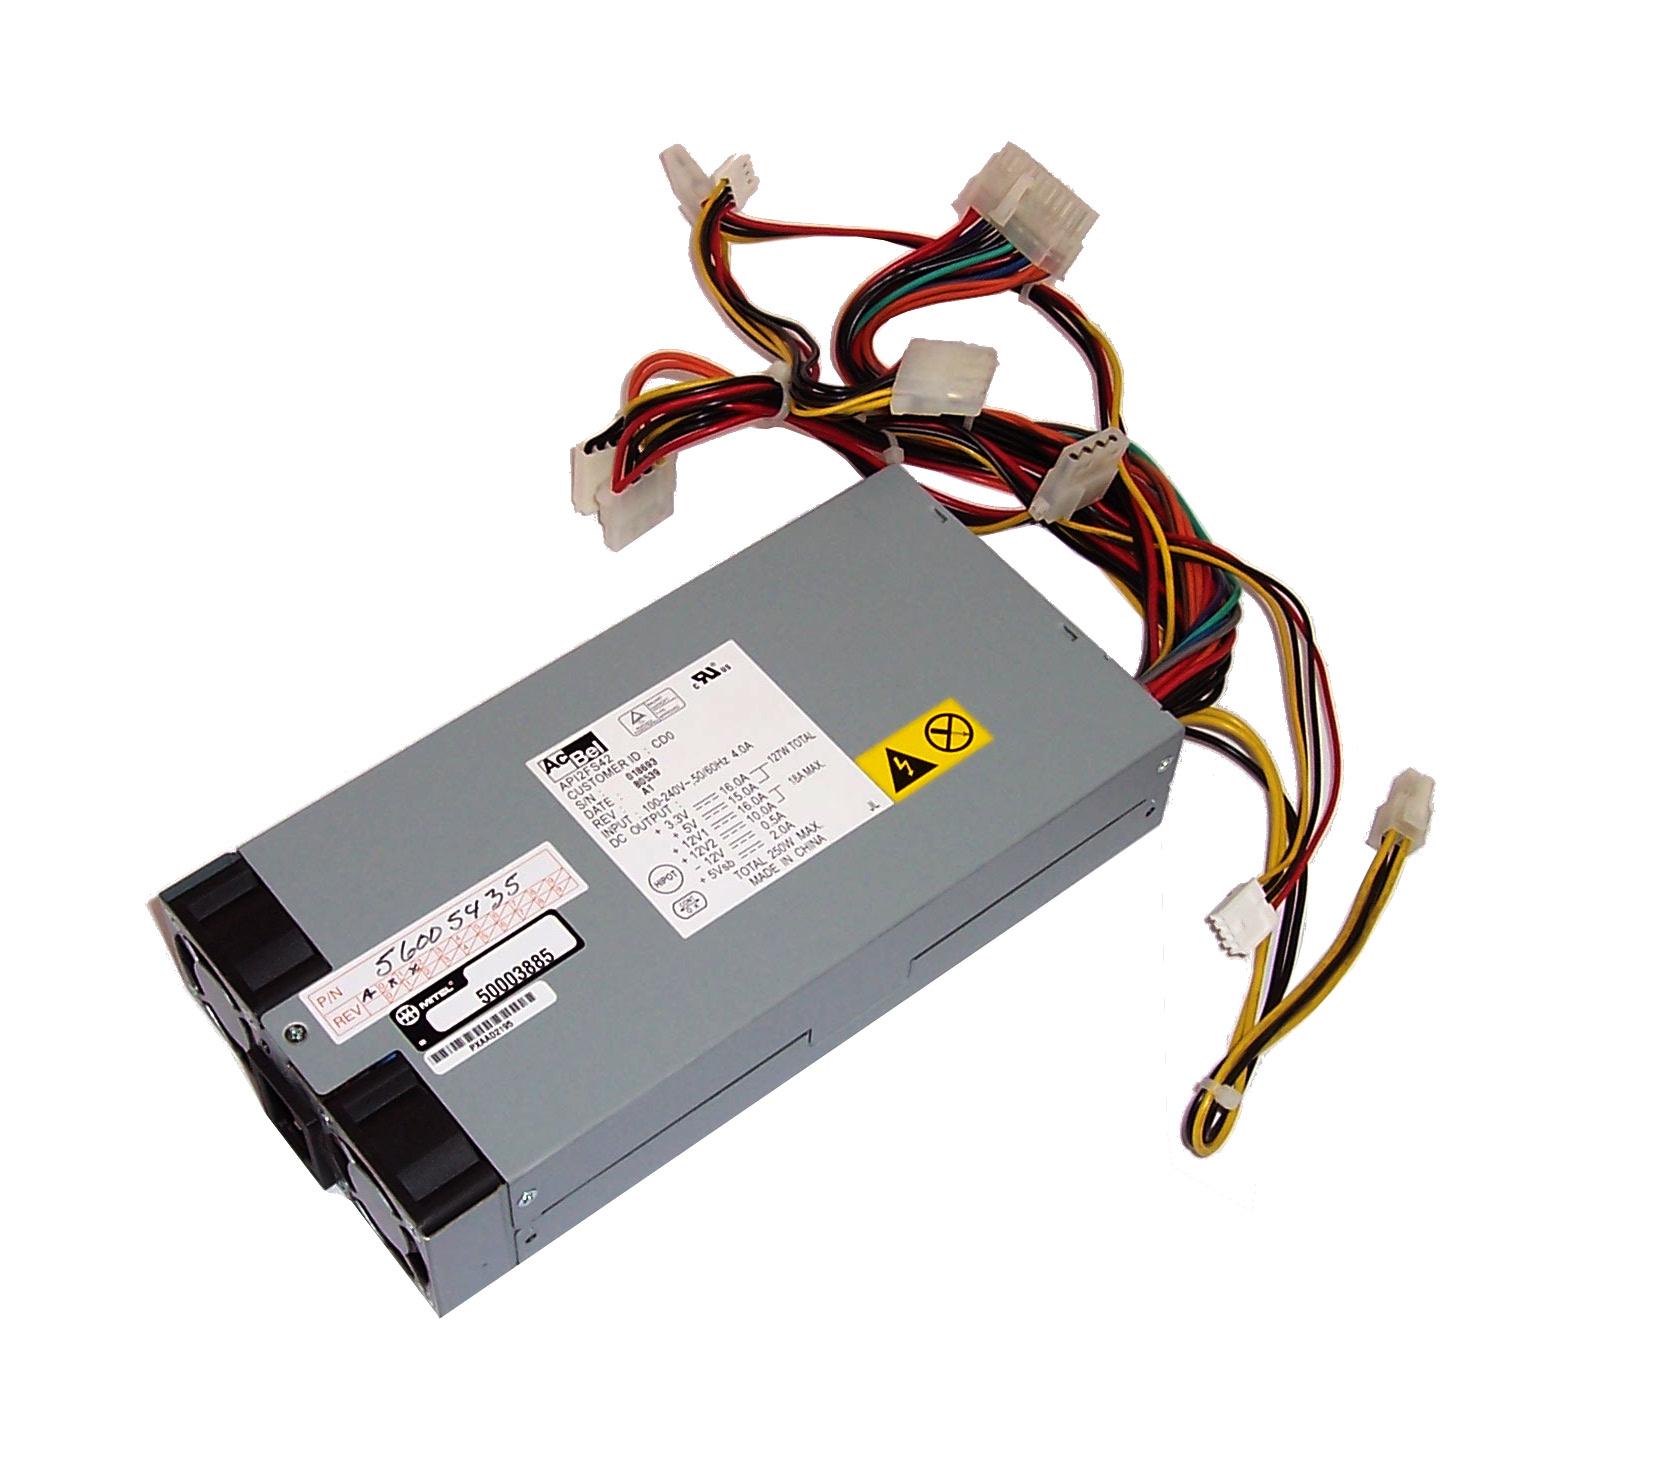 Mitel 50003885 3300 MX CX Controller 250W Power Supply - AcBel